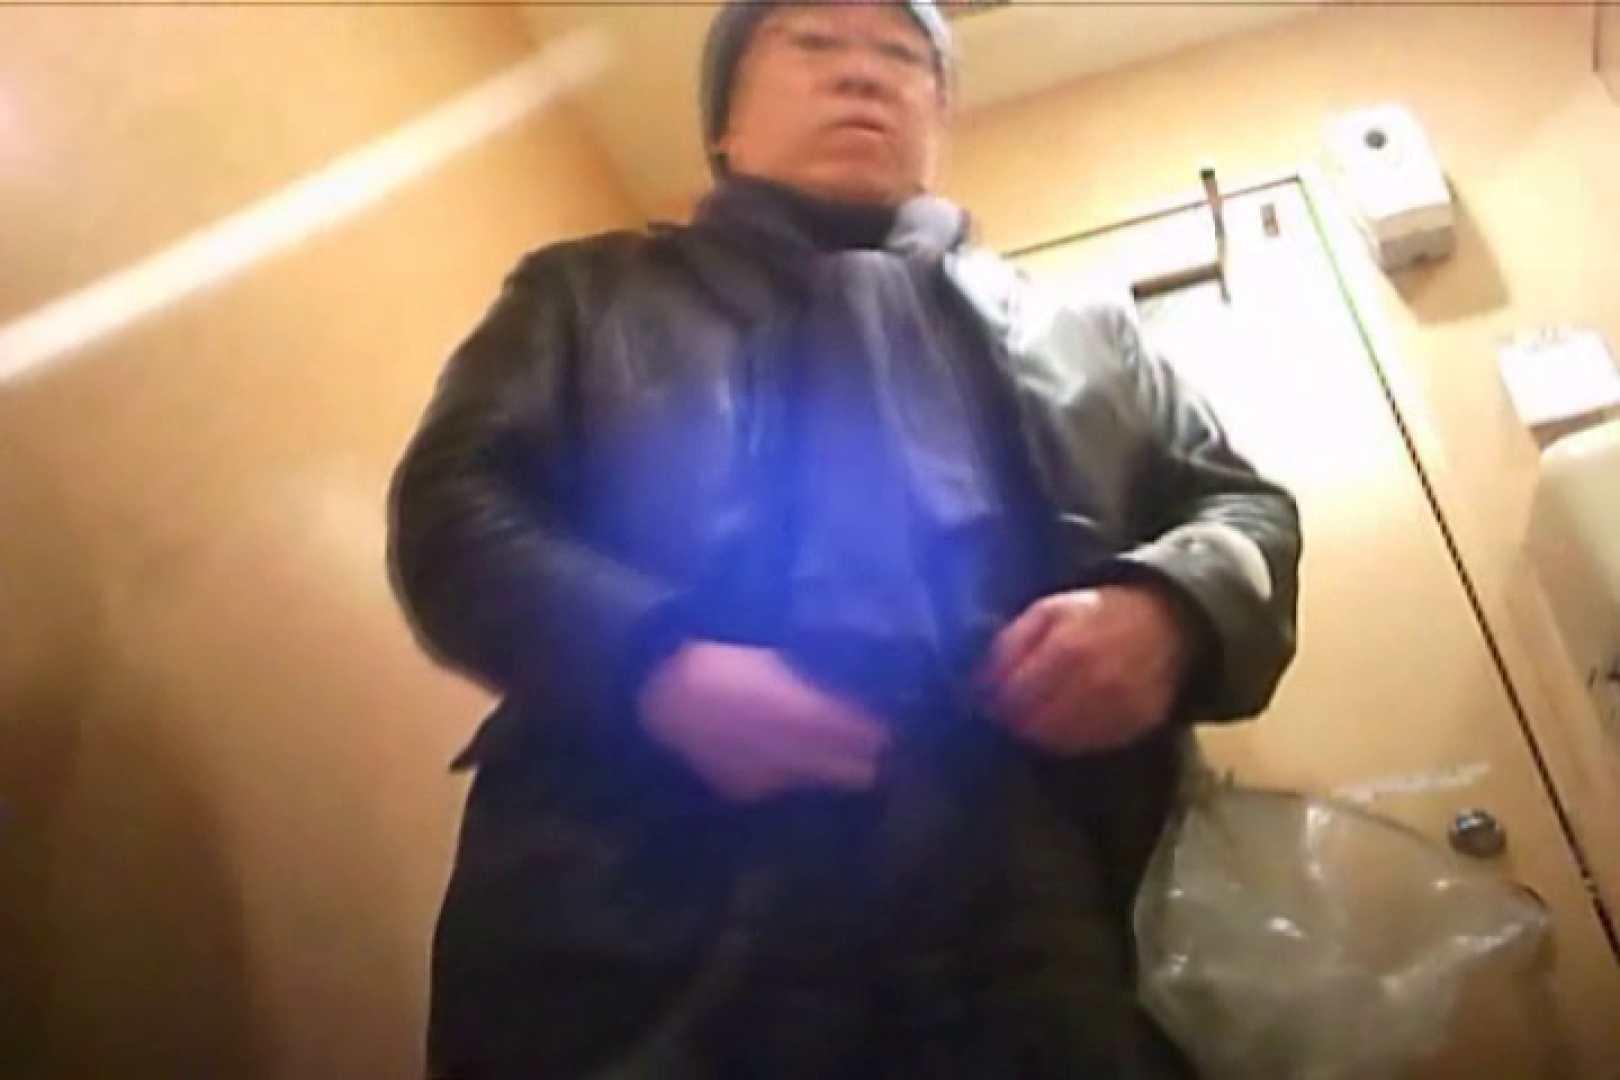 SEASON 2ND!掴み取りさんの洗面所覗き!in新幹線!VOL.01 リーマン系な男たち ゲイエロ動画 104連発 38